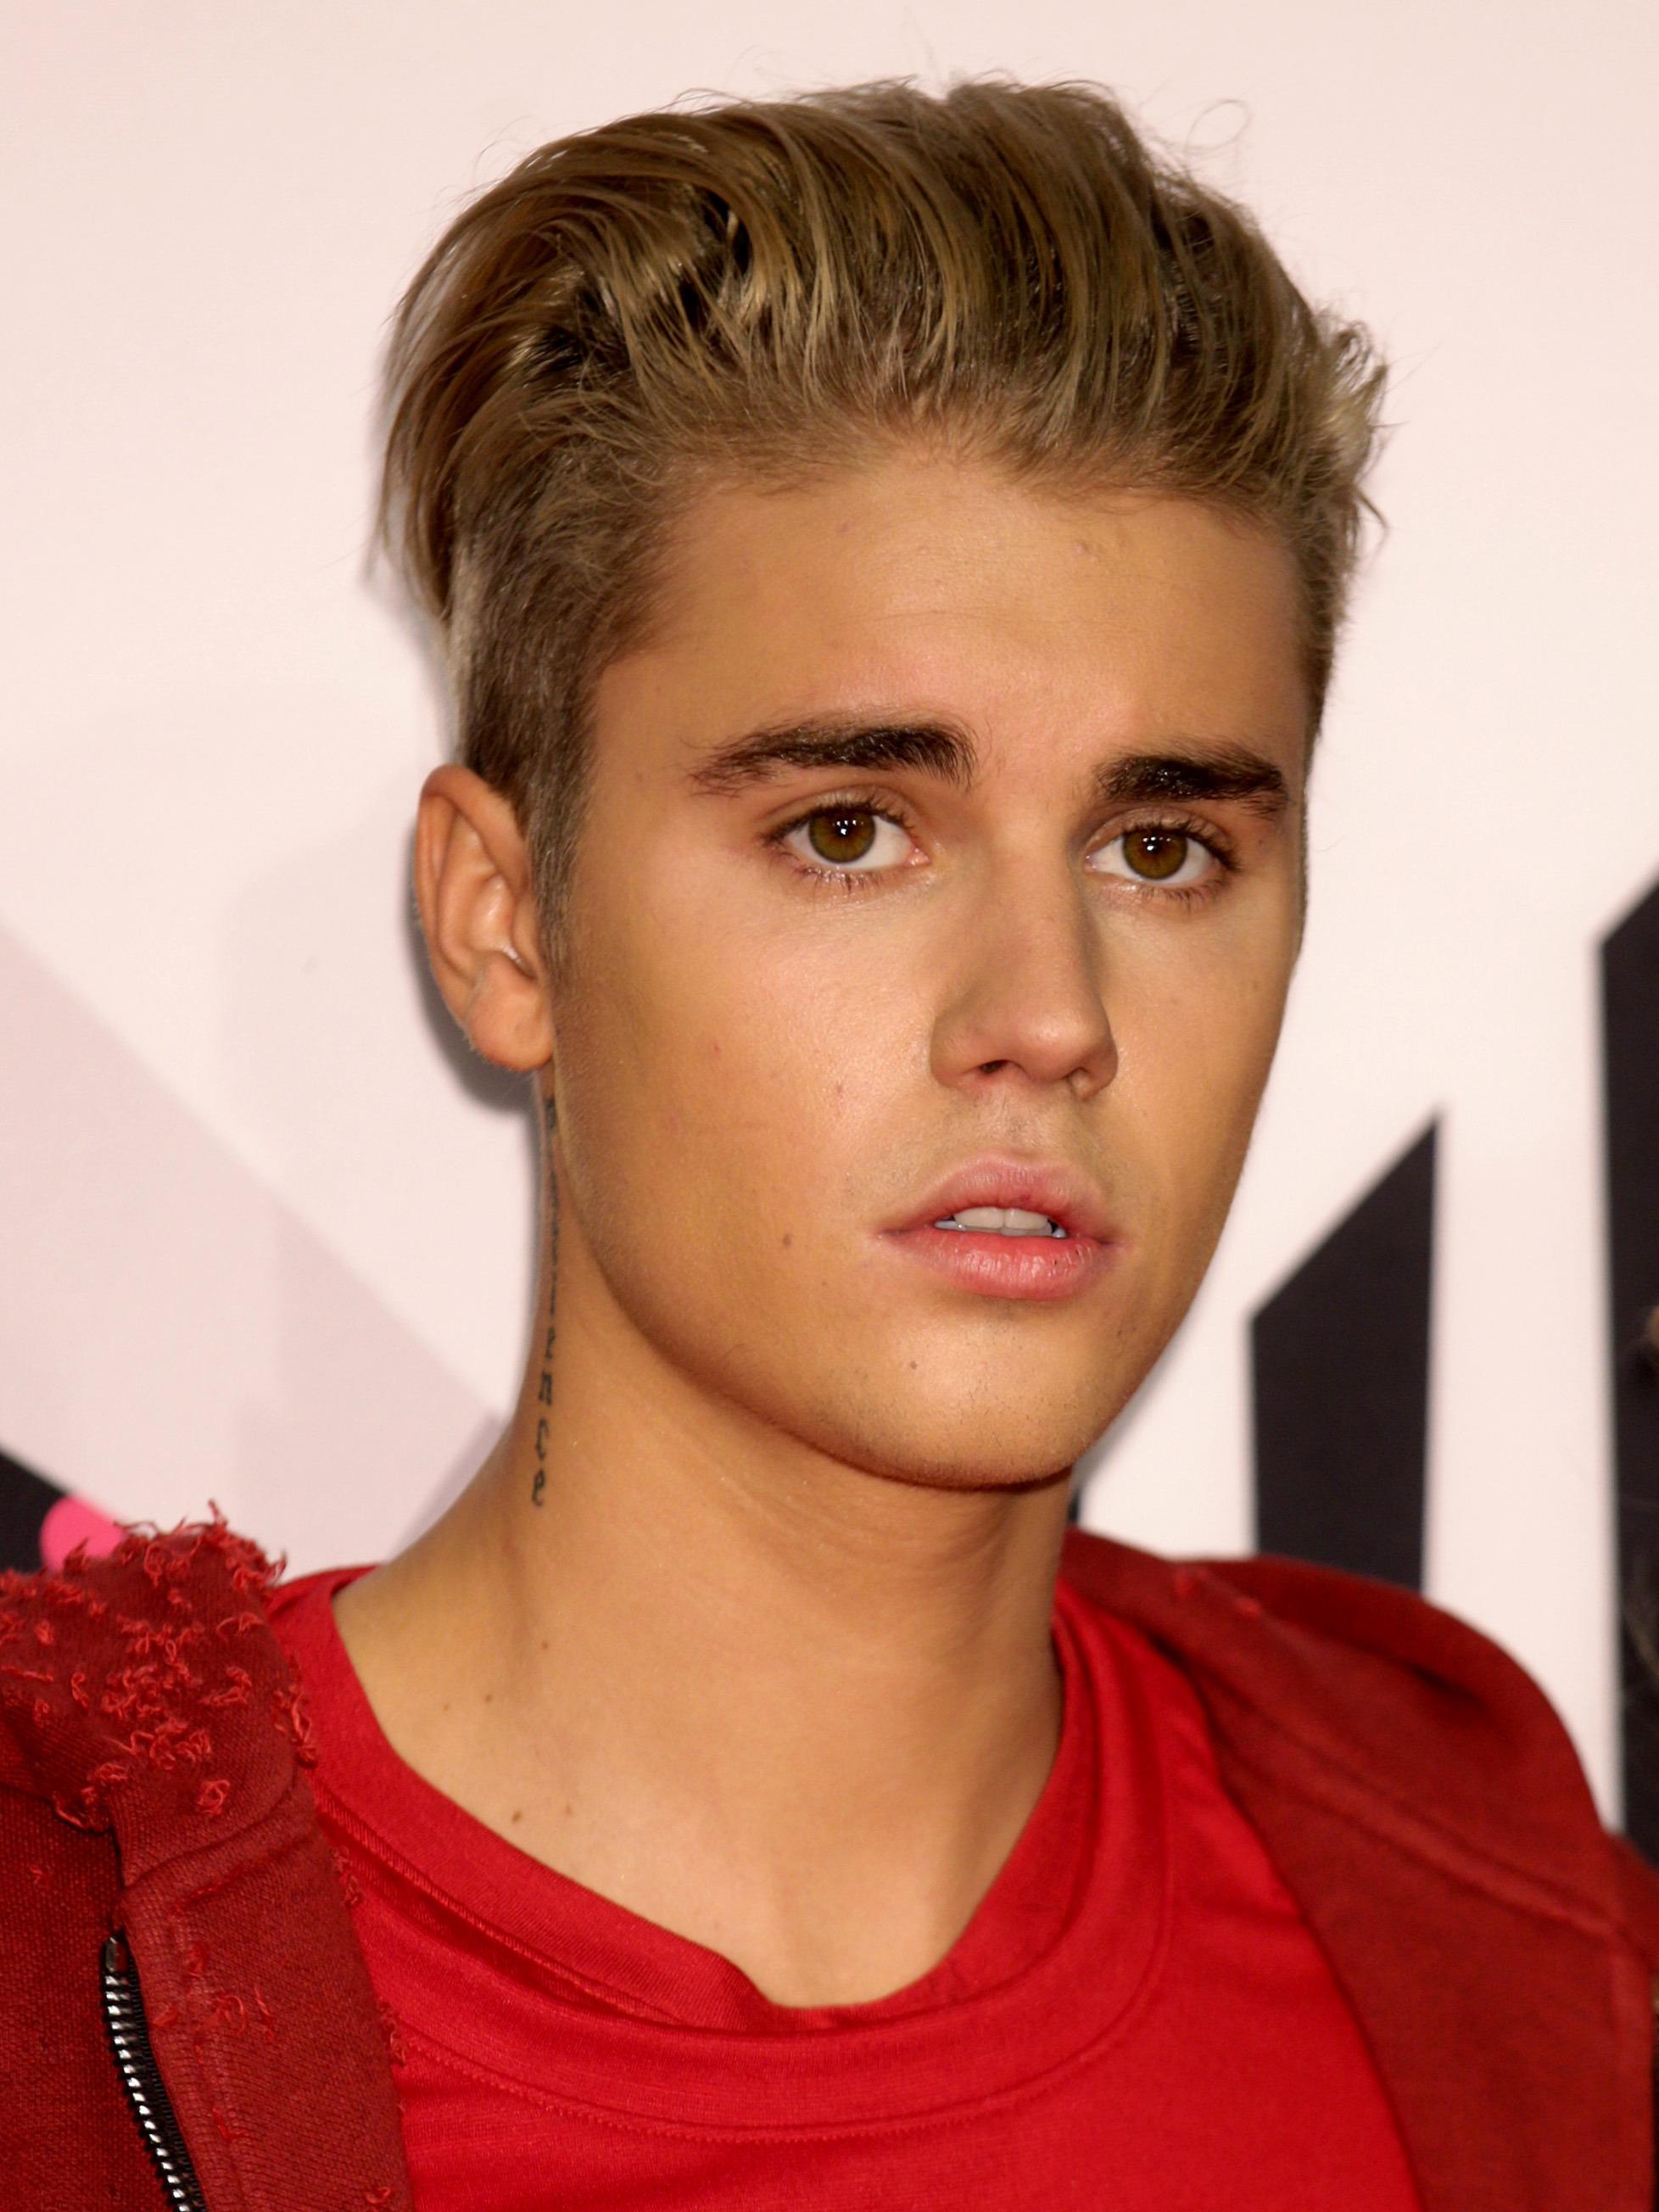 Old Car Video Justin Bieber